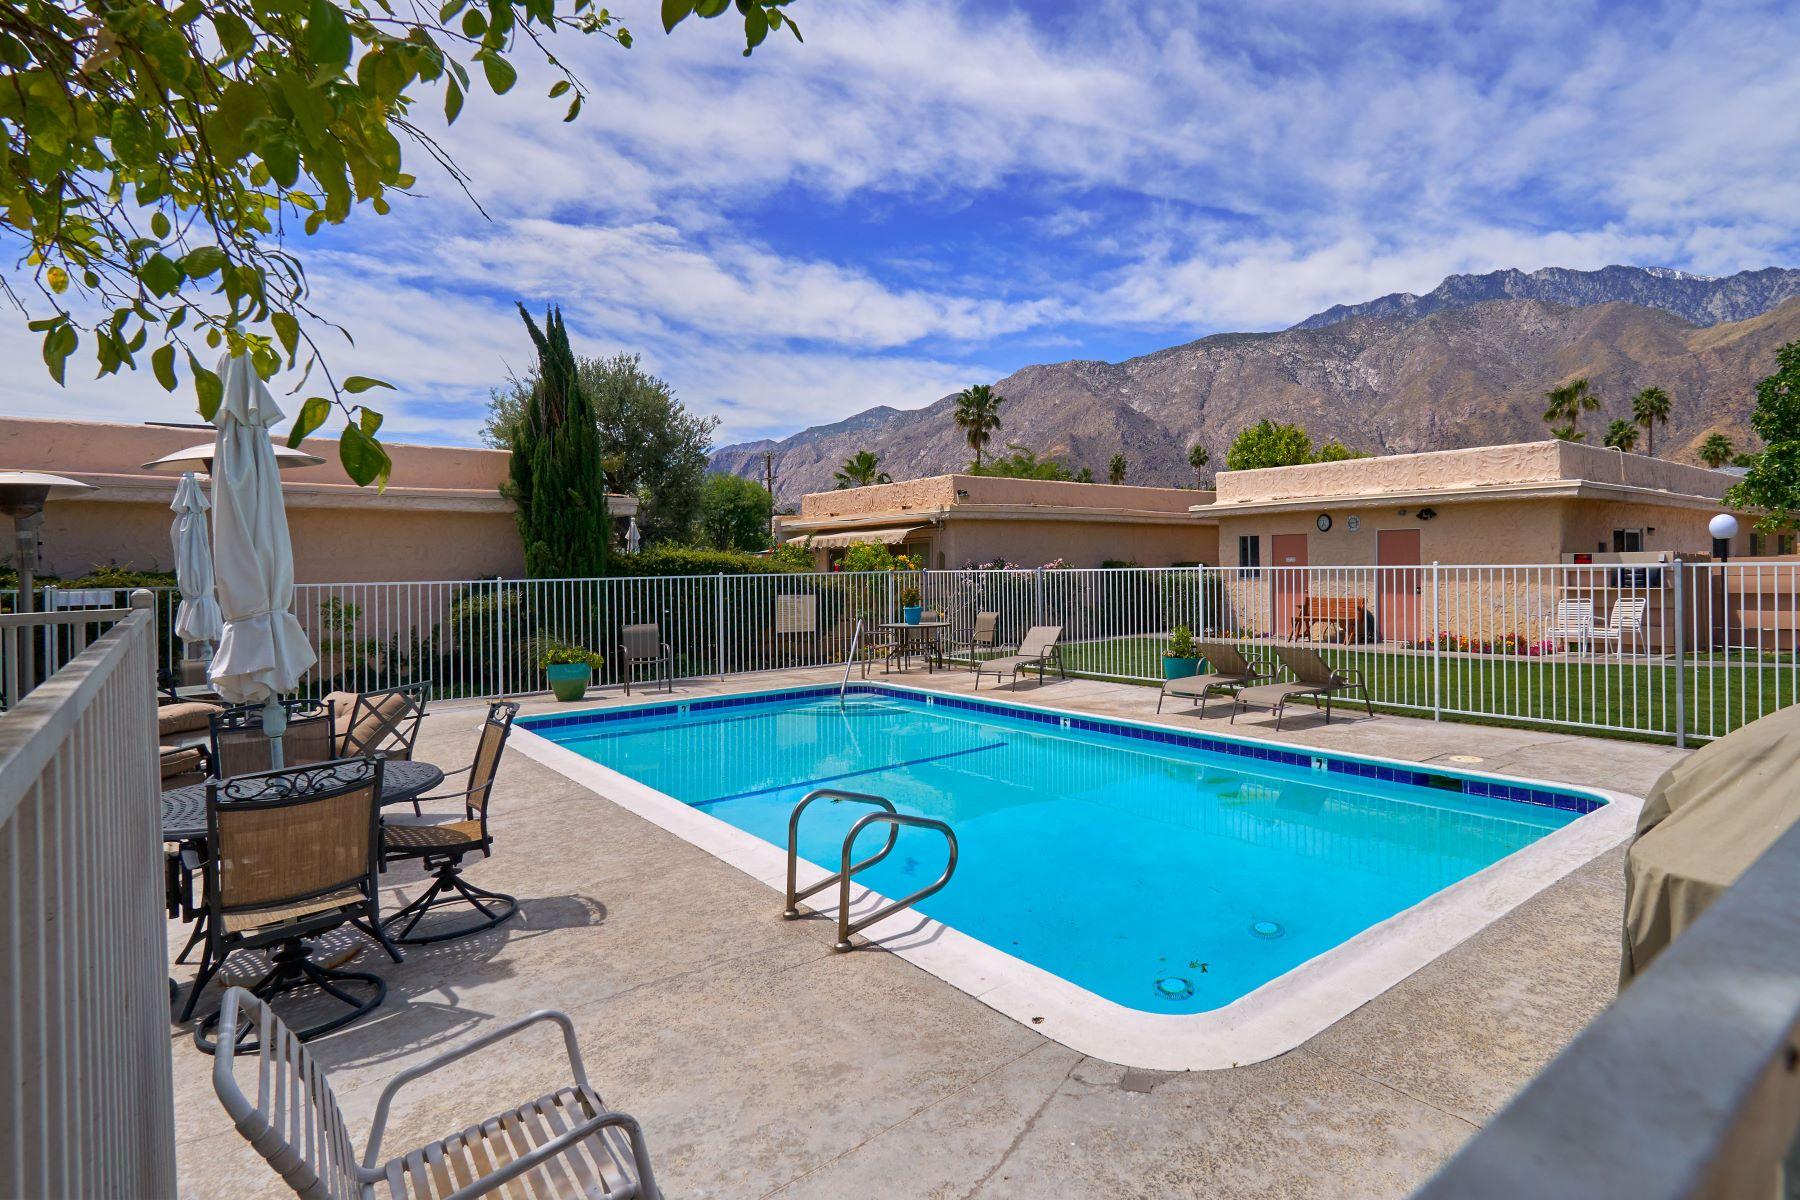 Proprietà in vendita North Palm Springs